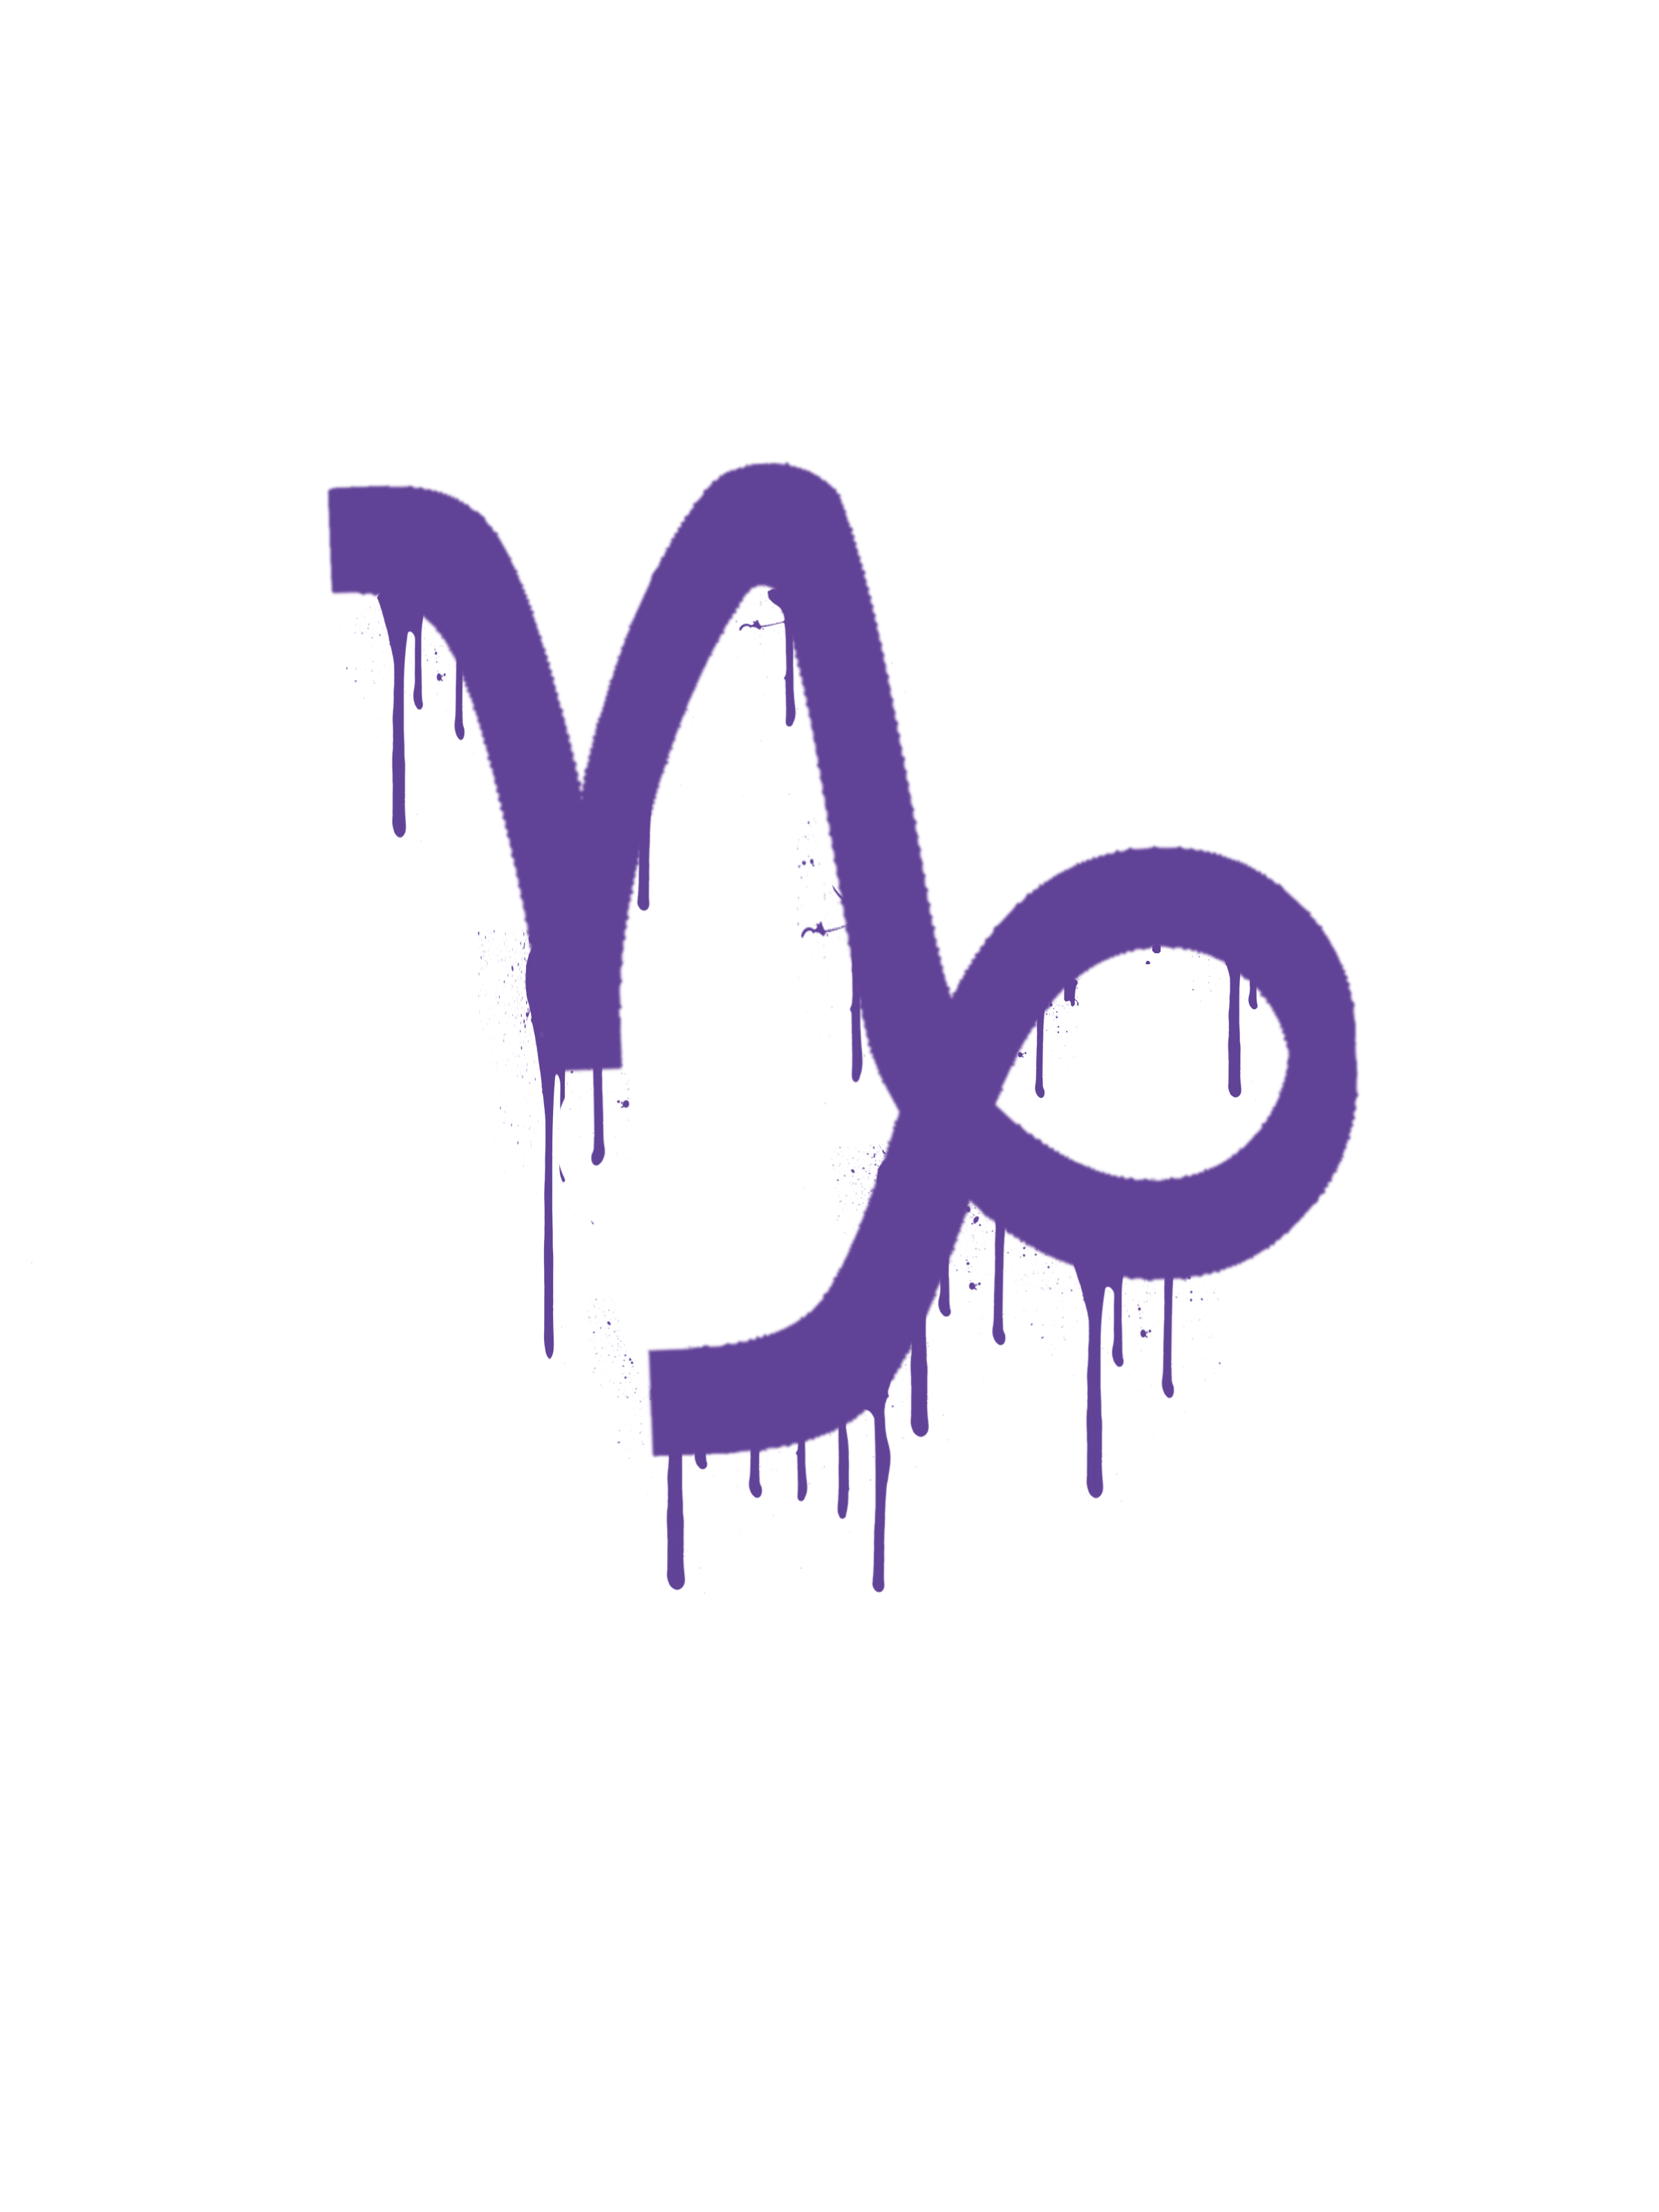 homestuck logo wallpaper - photo #3